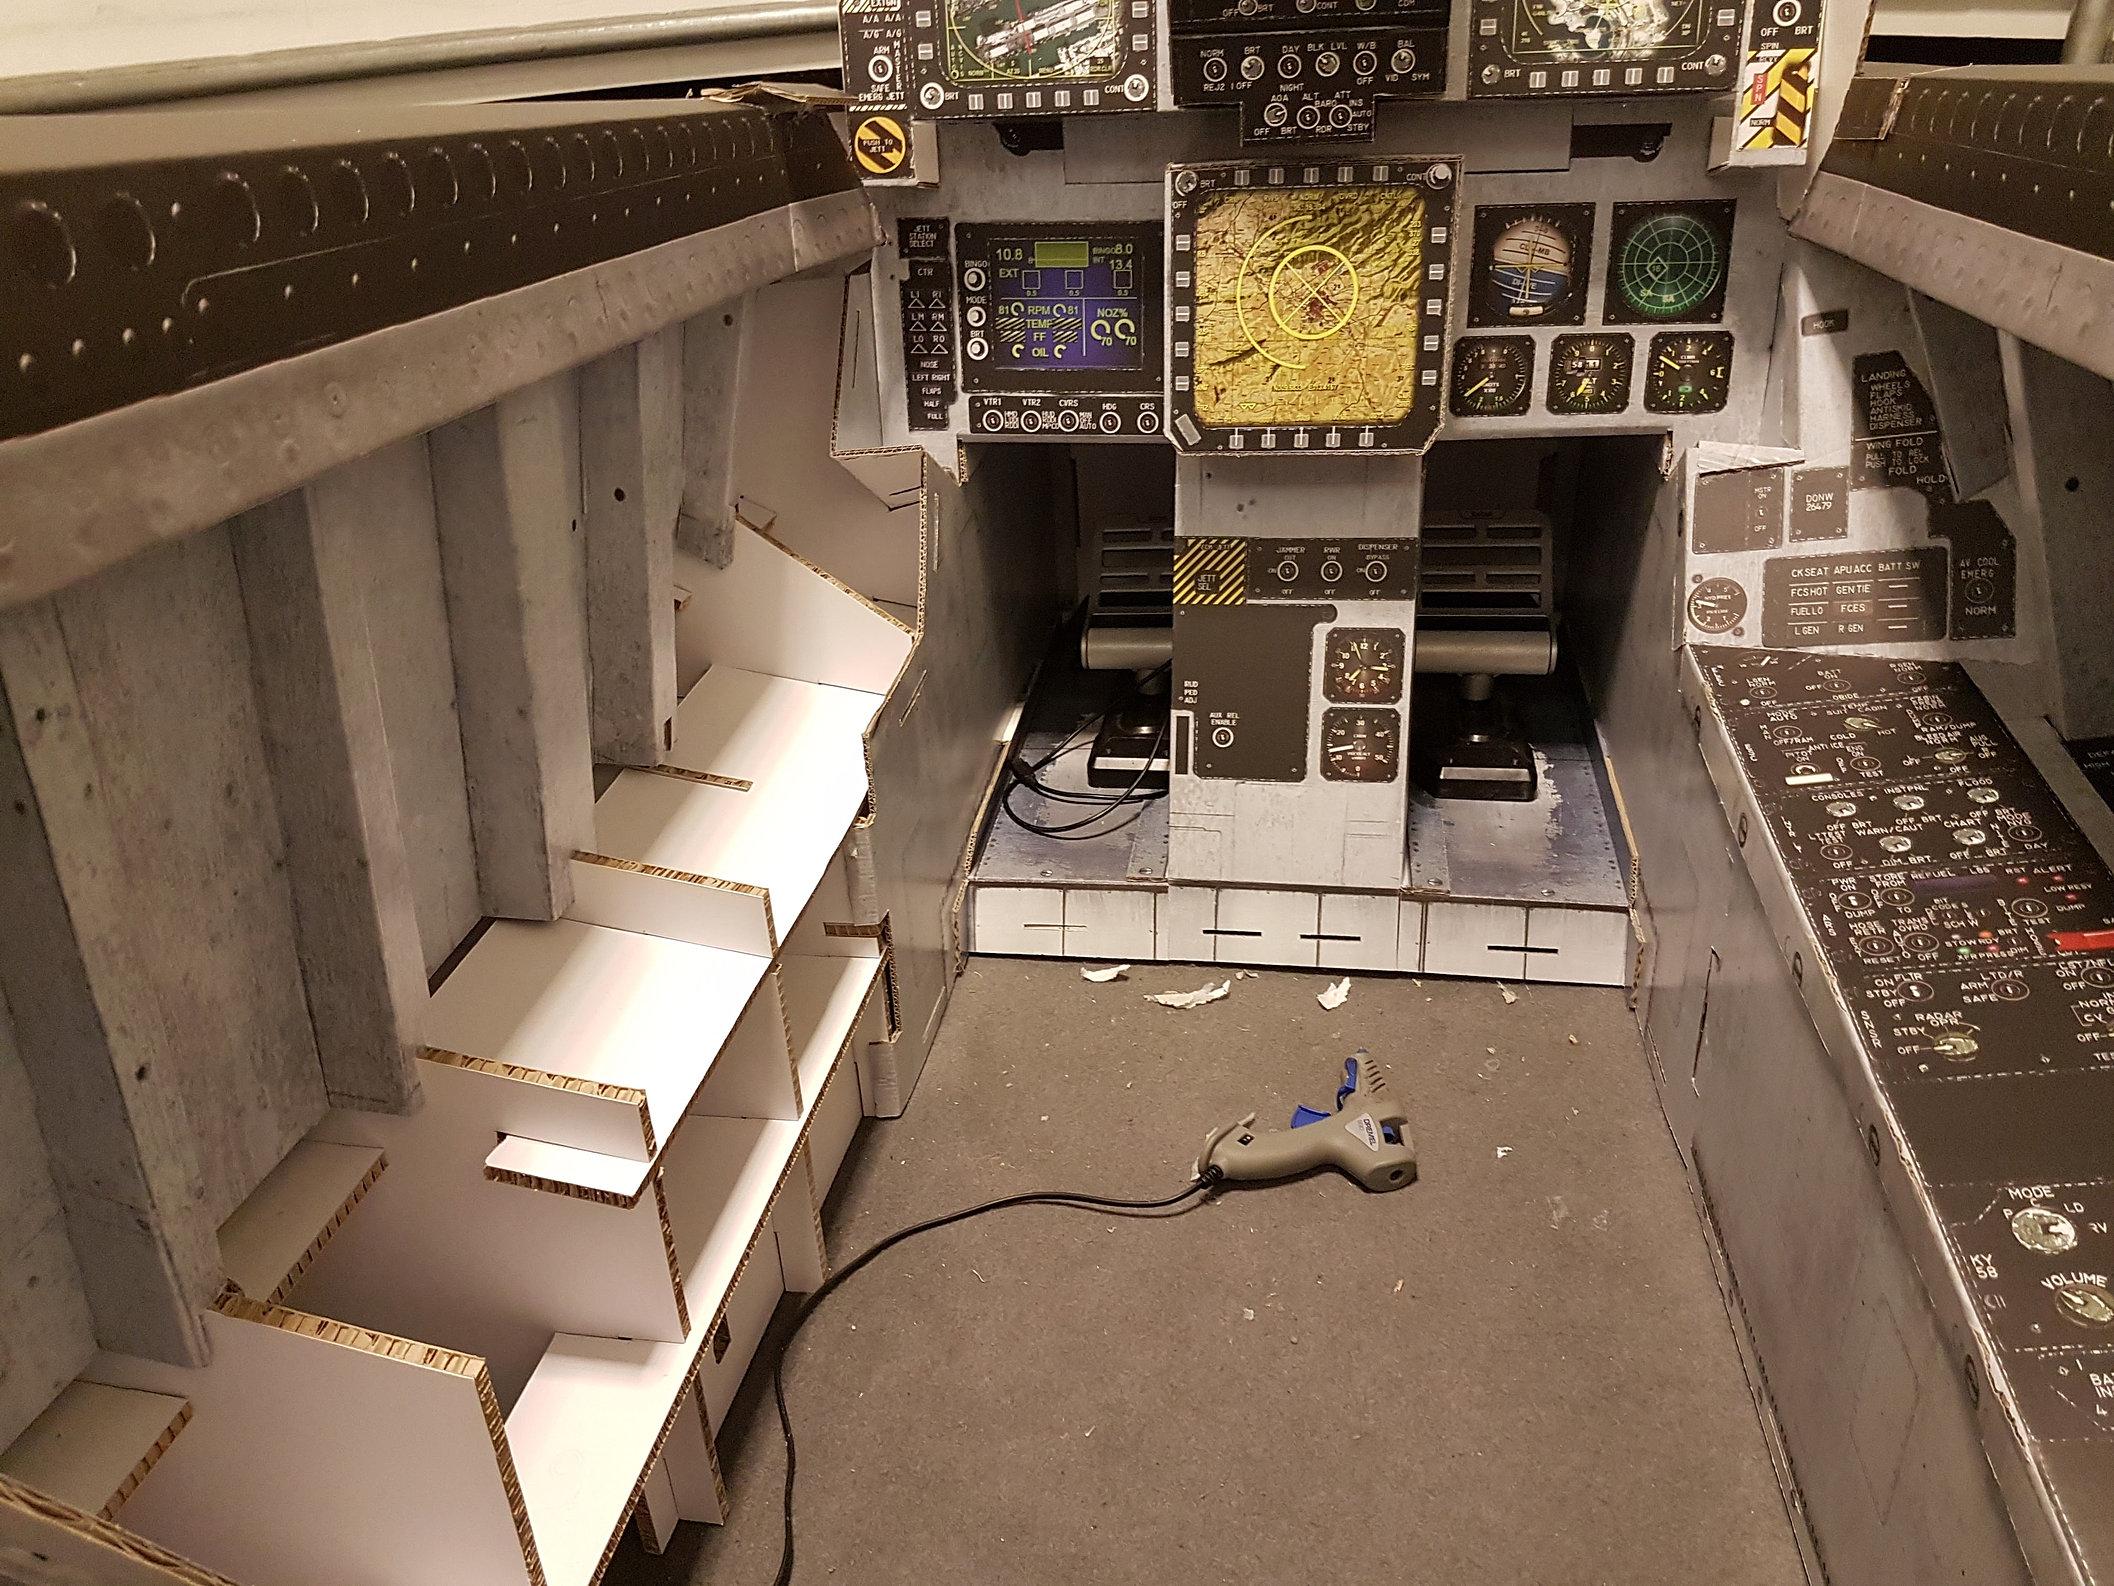 F-18 simulator cockpit|gallery|Dogfight Boss